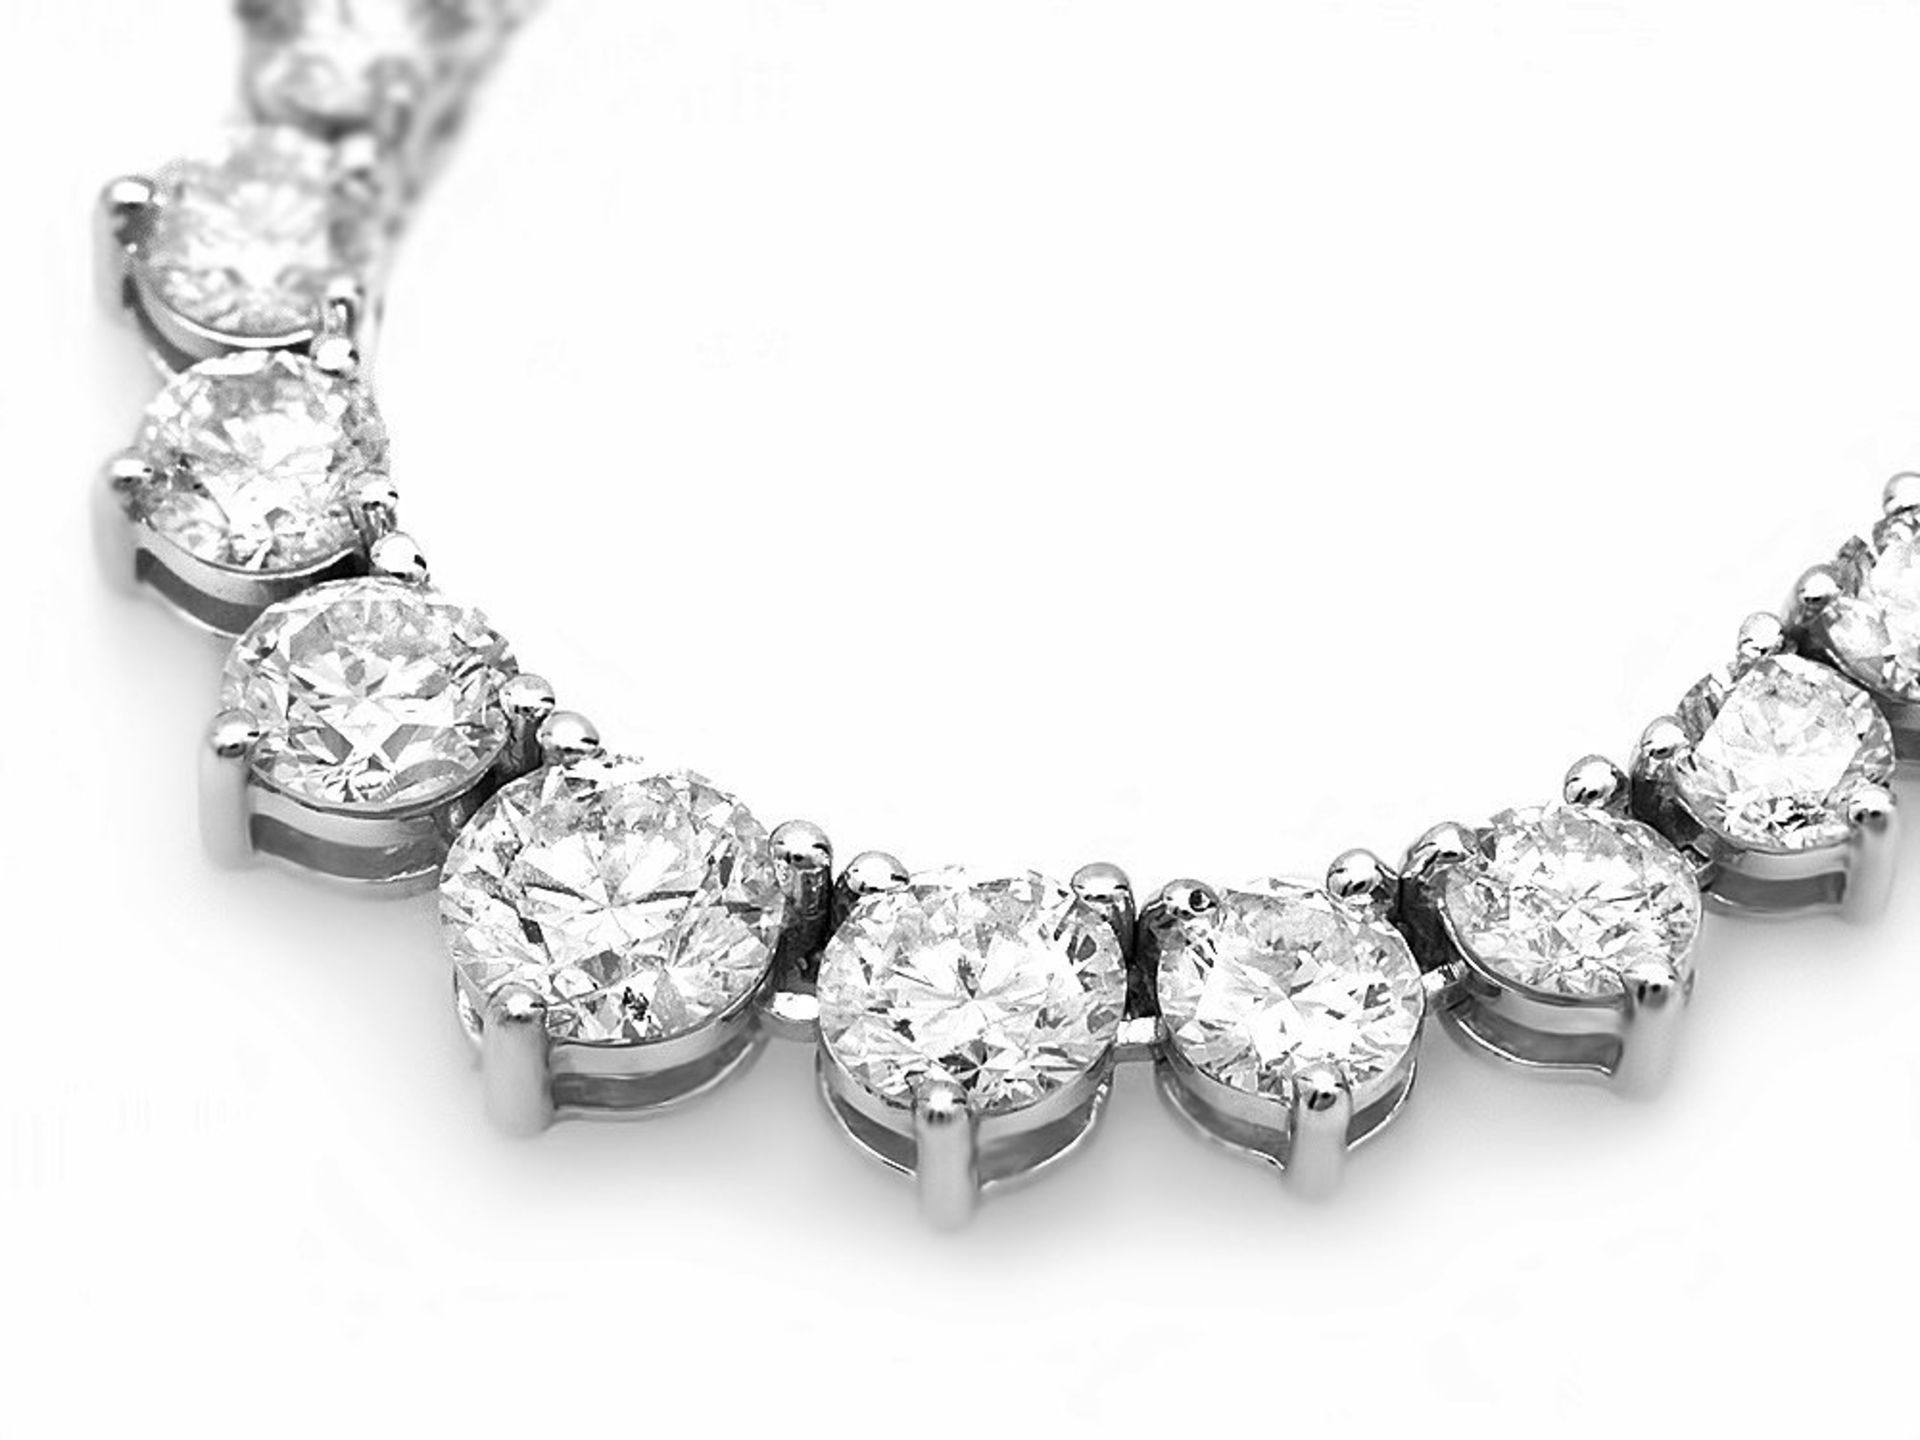 18k White Gold 9.50ct Diamond Necklace - Image 3 of 5